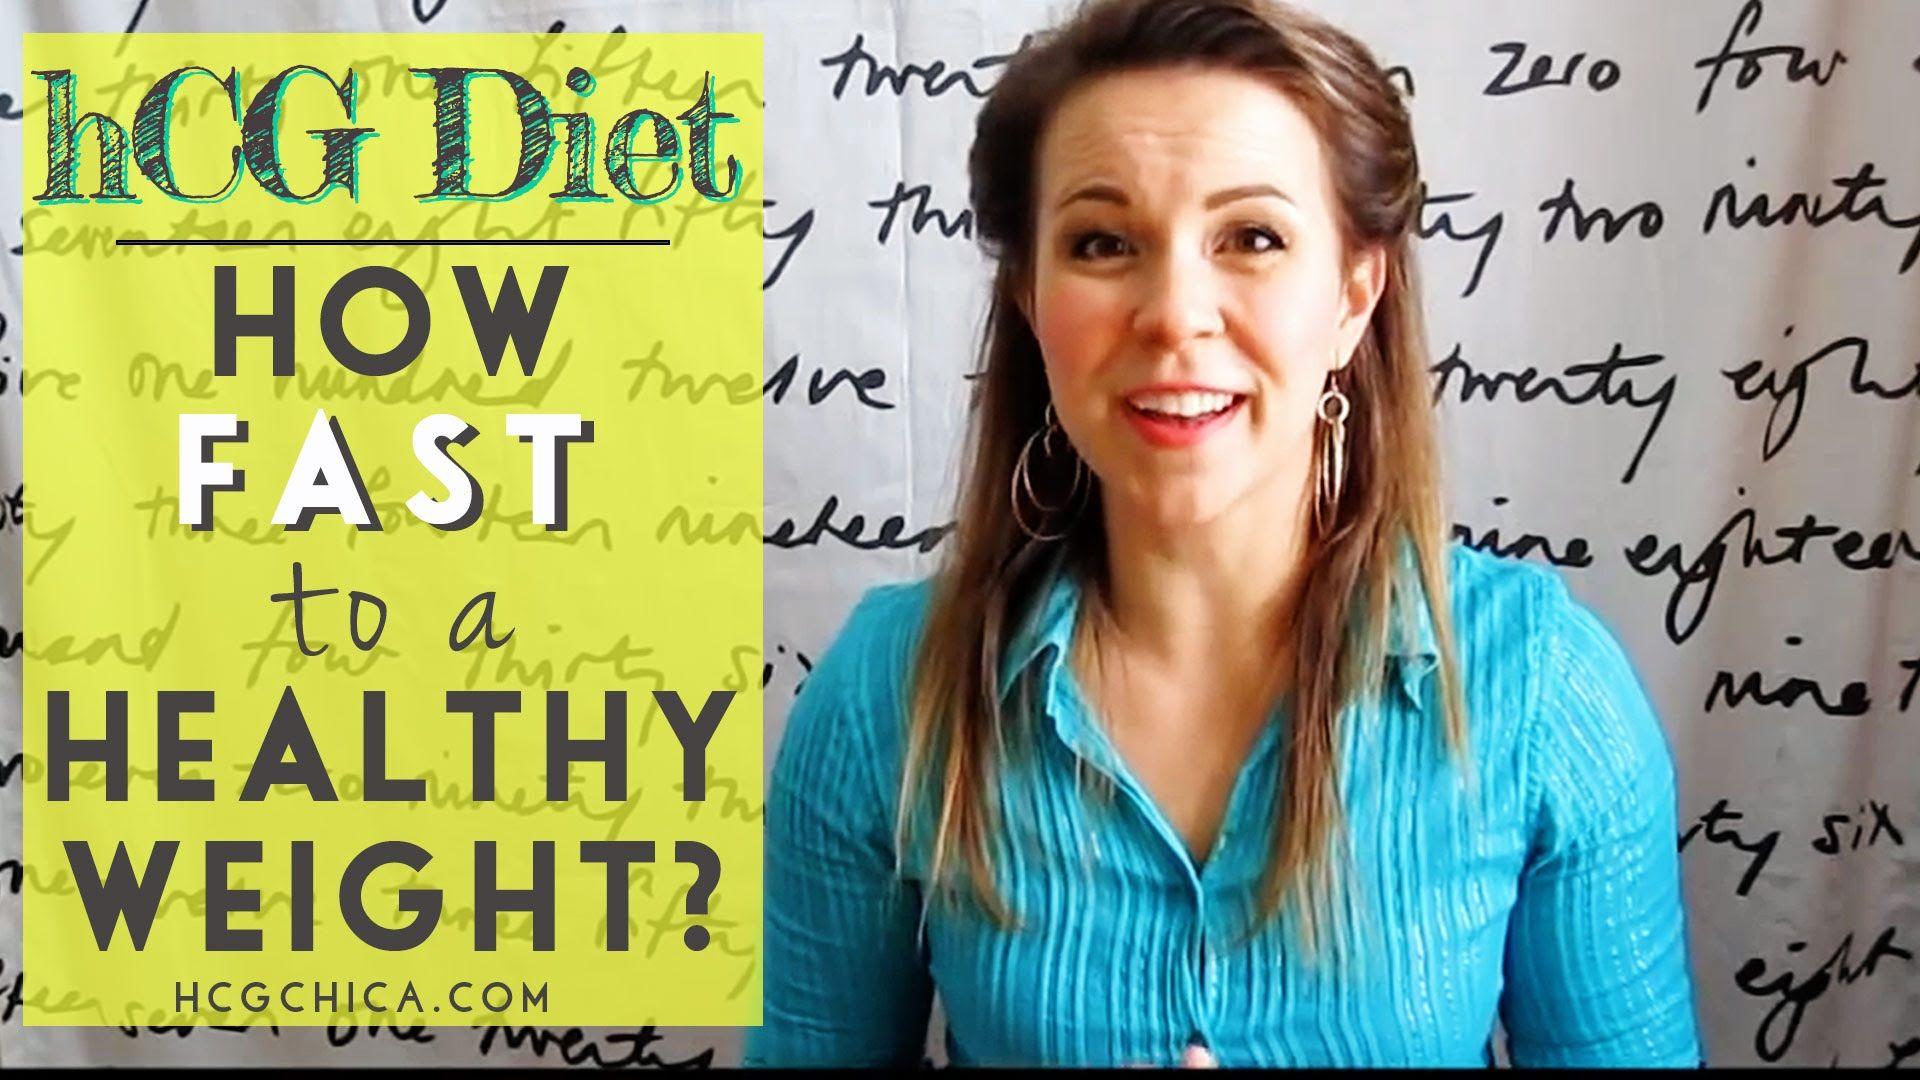 La fitness weight loss program